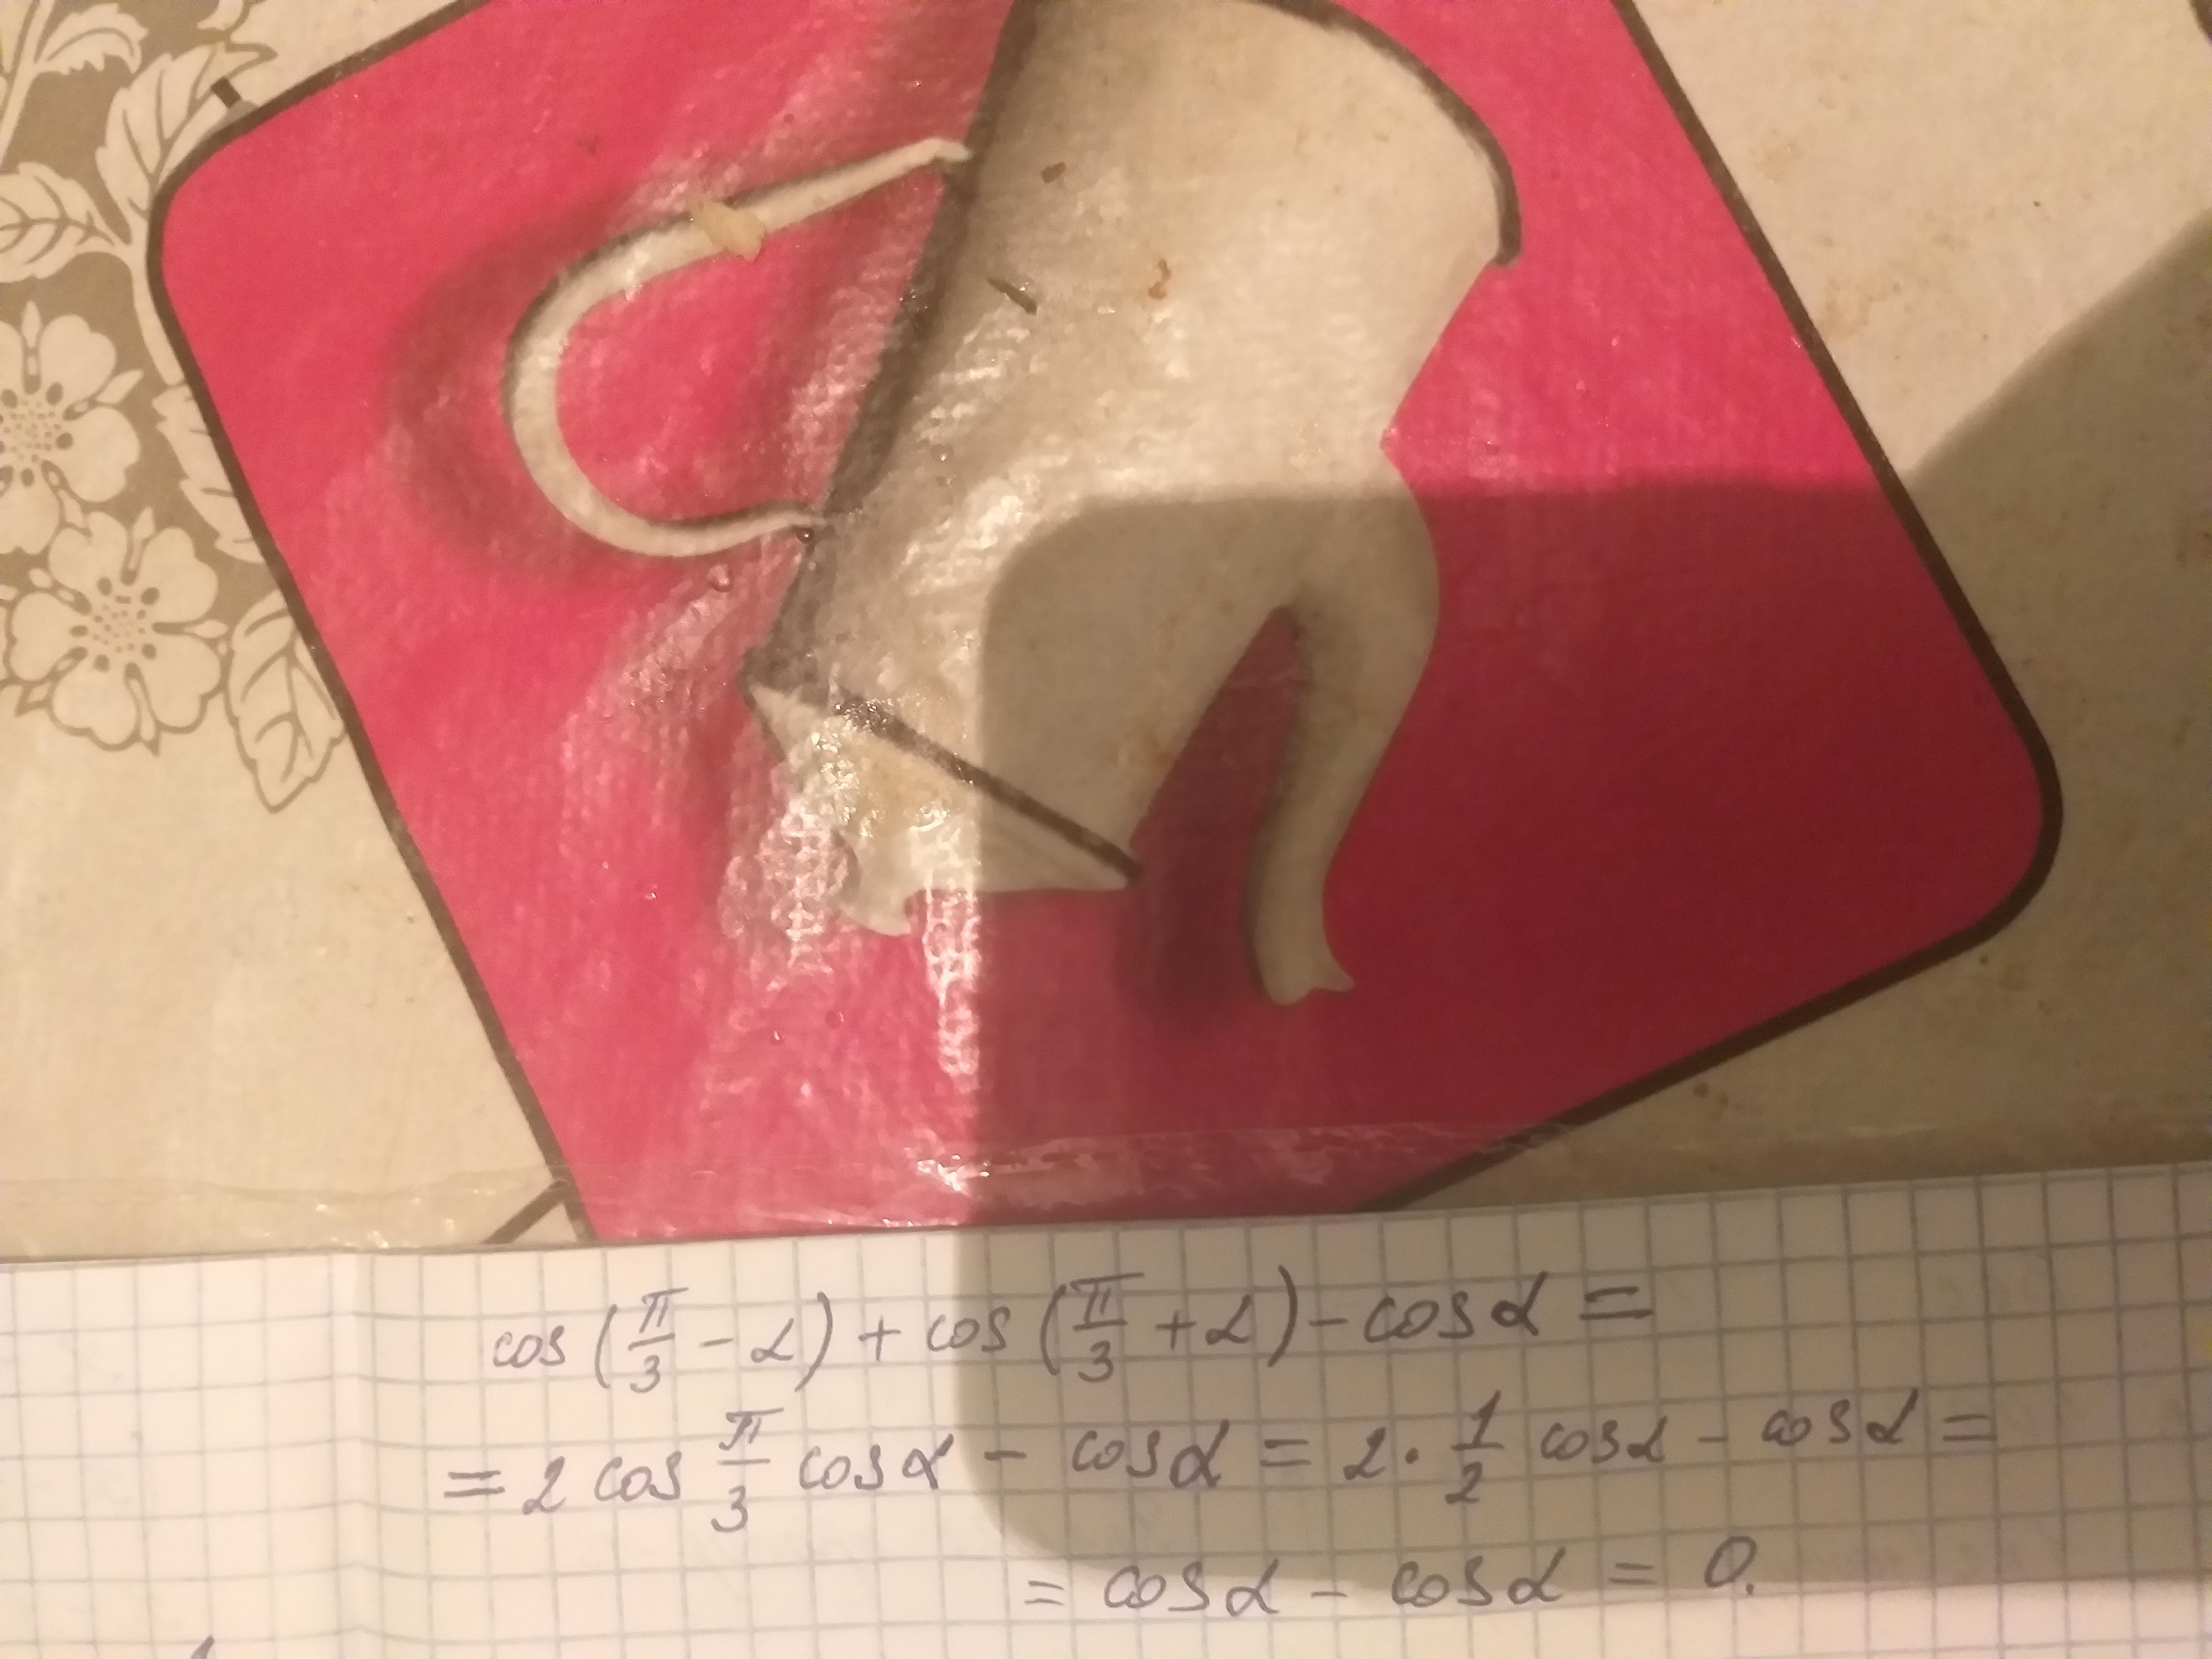 Cos(П/3-а)+cos(П/3+а)-cosa пожалуйста помогите